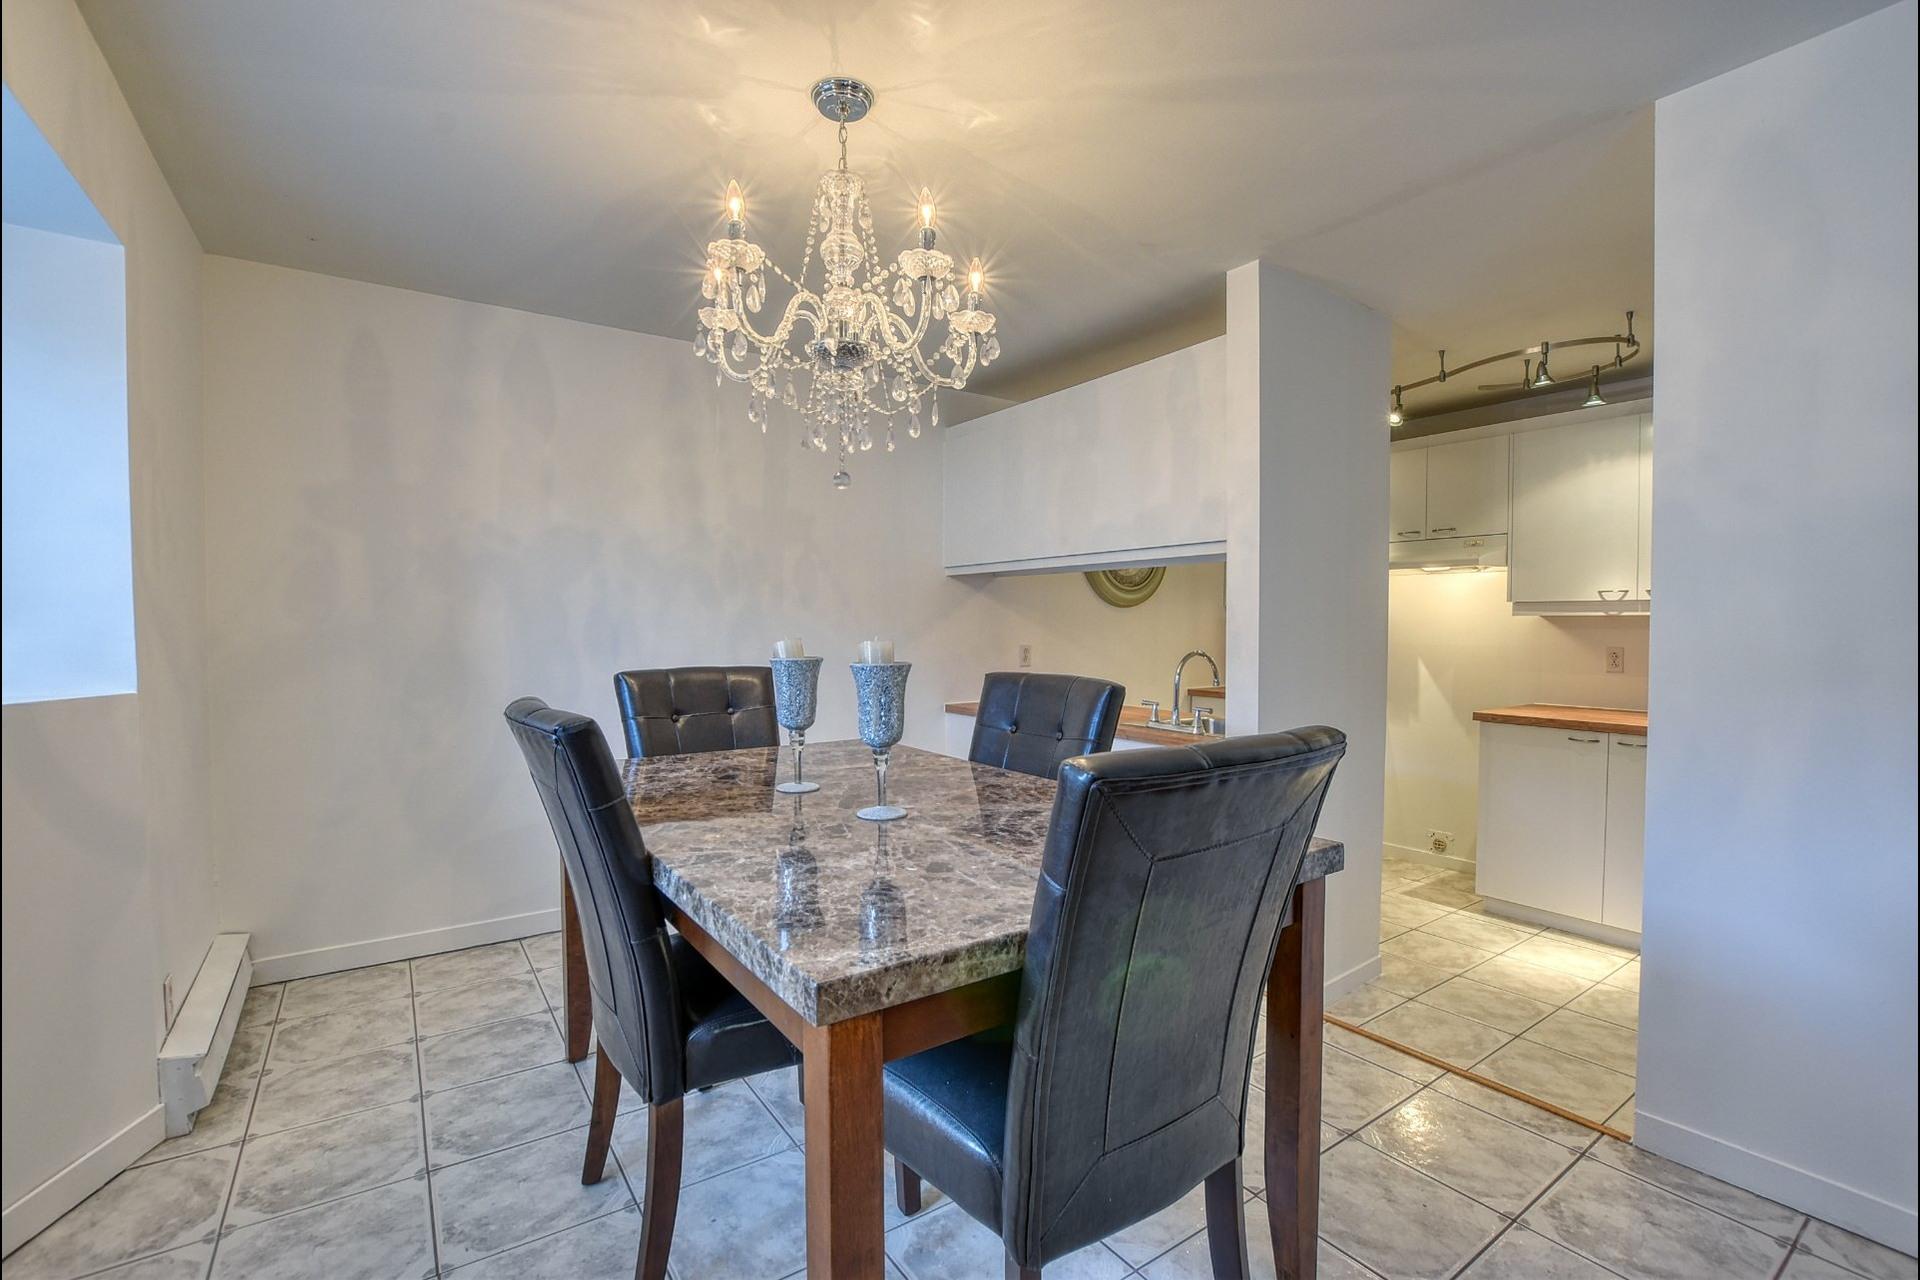 image 6 - Apartment For sale Repentigny Repentigny  - 5 rooms